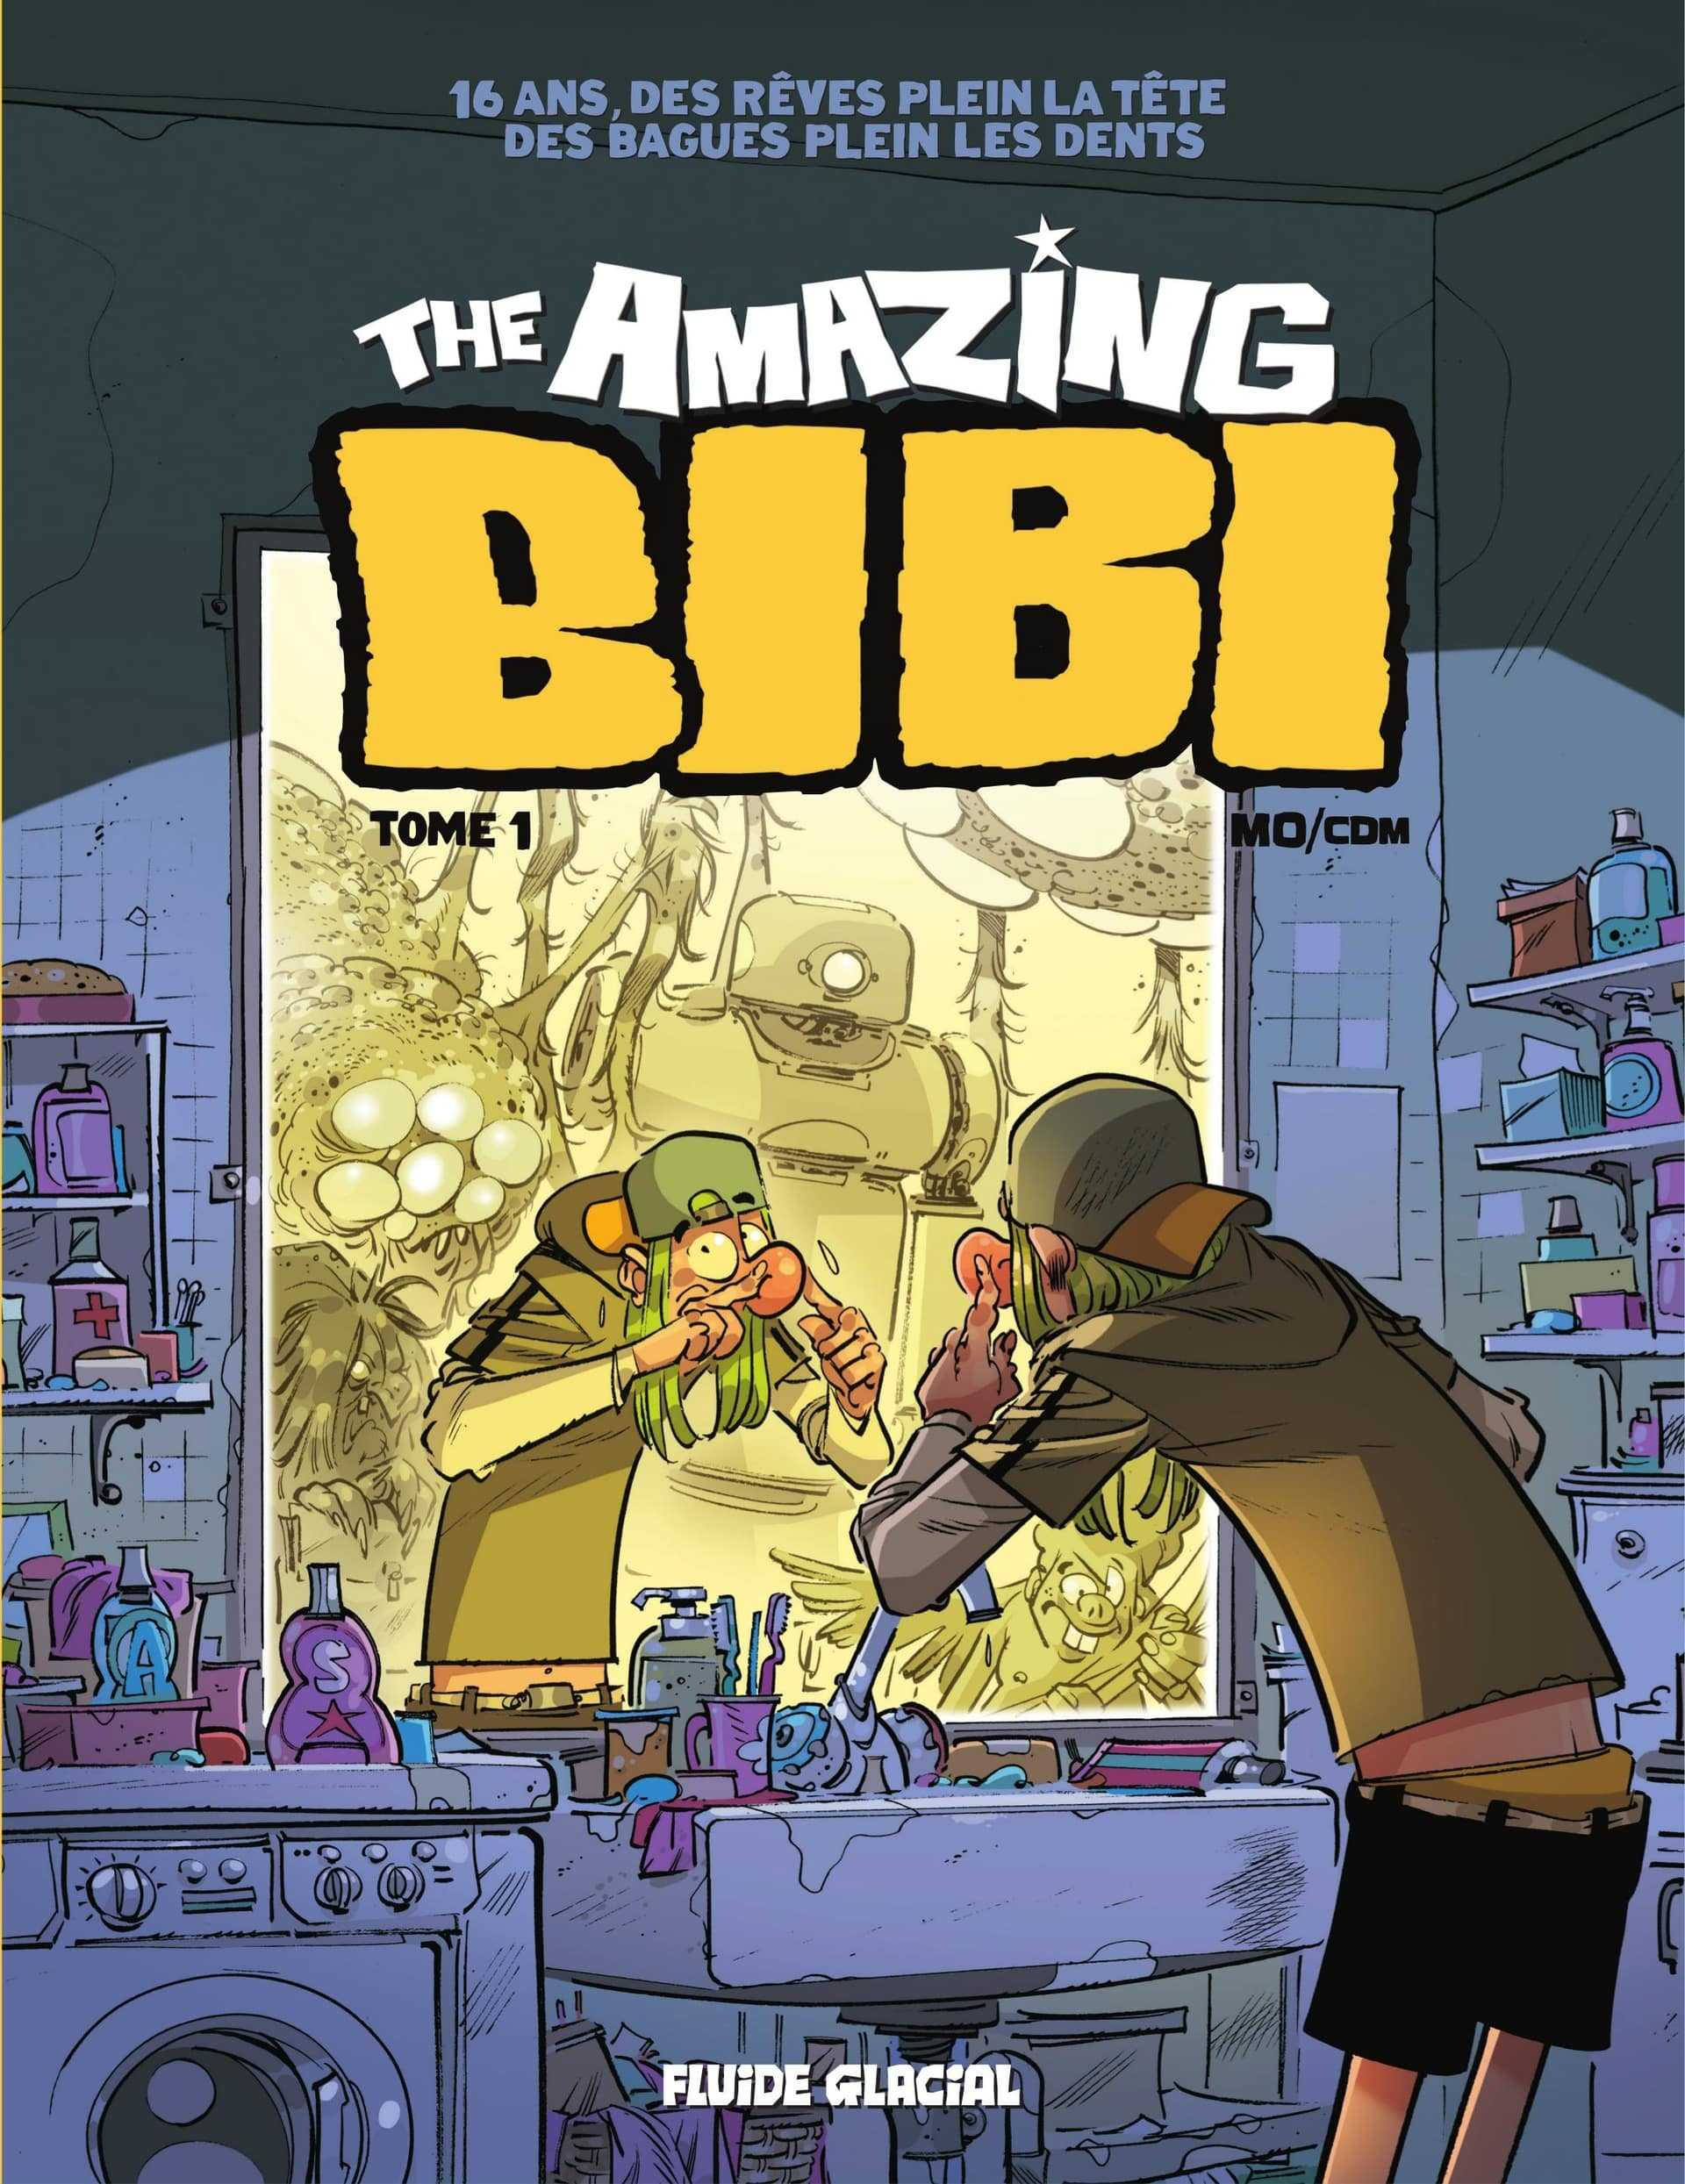 The Amazing Bibi, une vraie synthèse d'ado